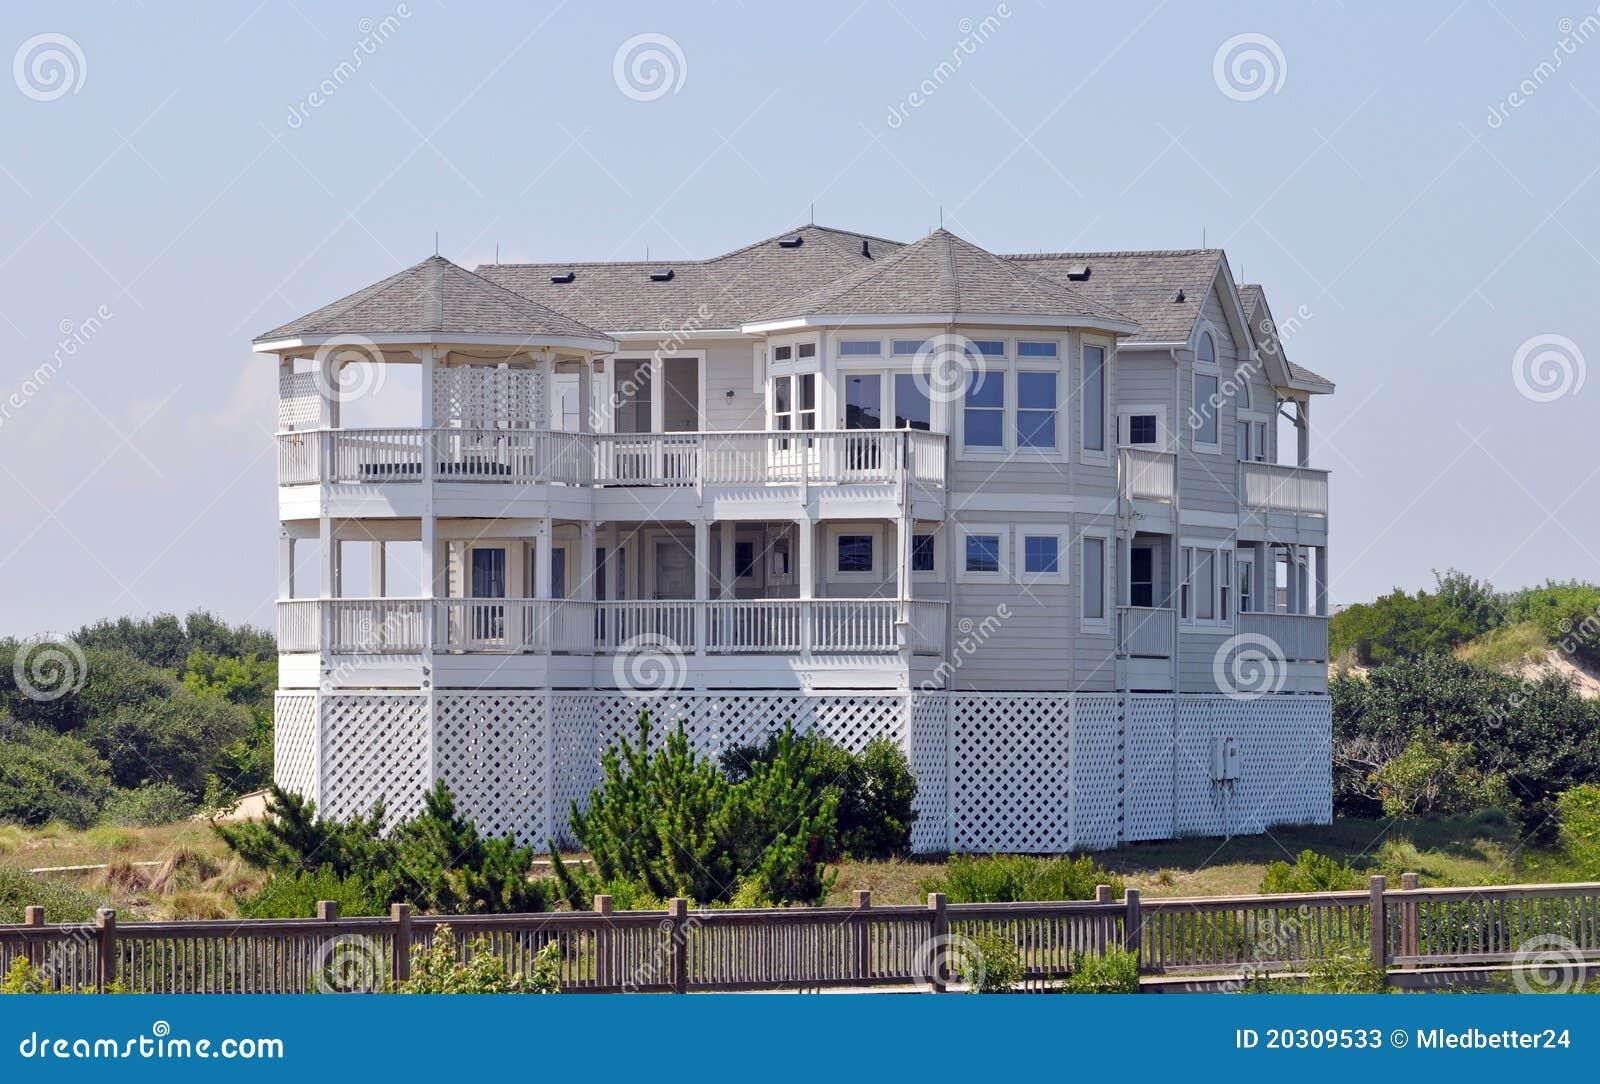 Beach house in north carolina stock photos image 20309533 for Deco maison de plage